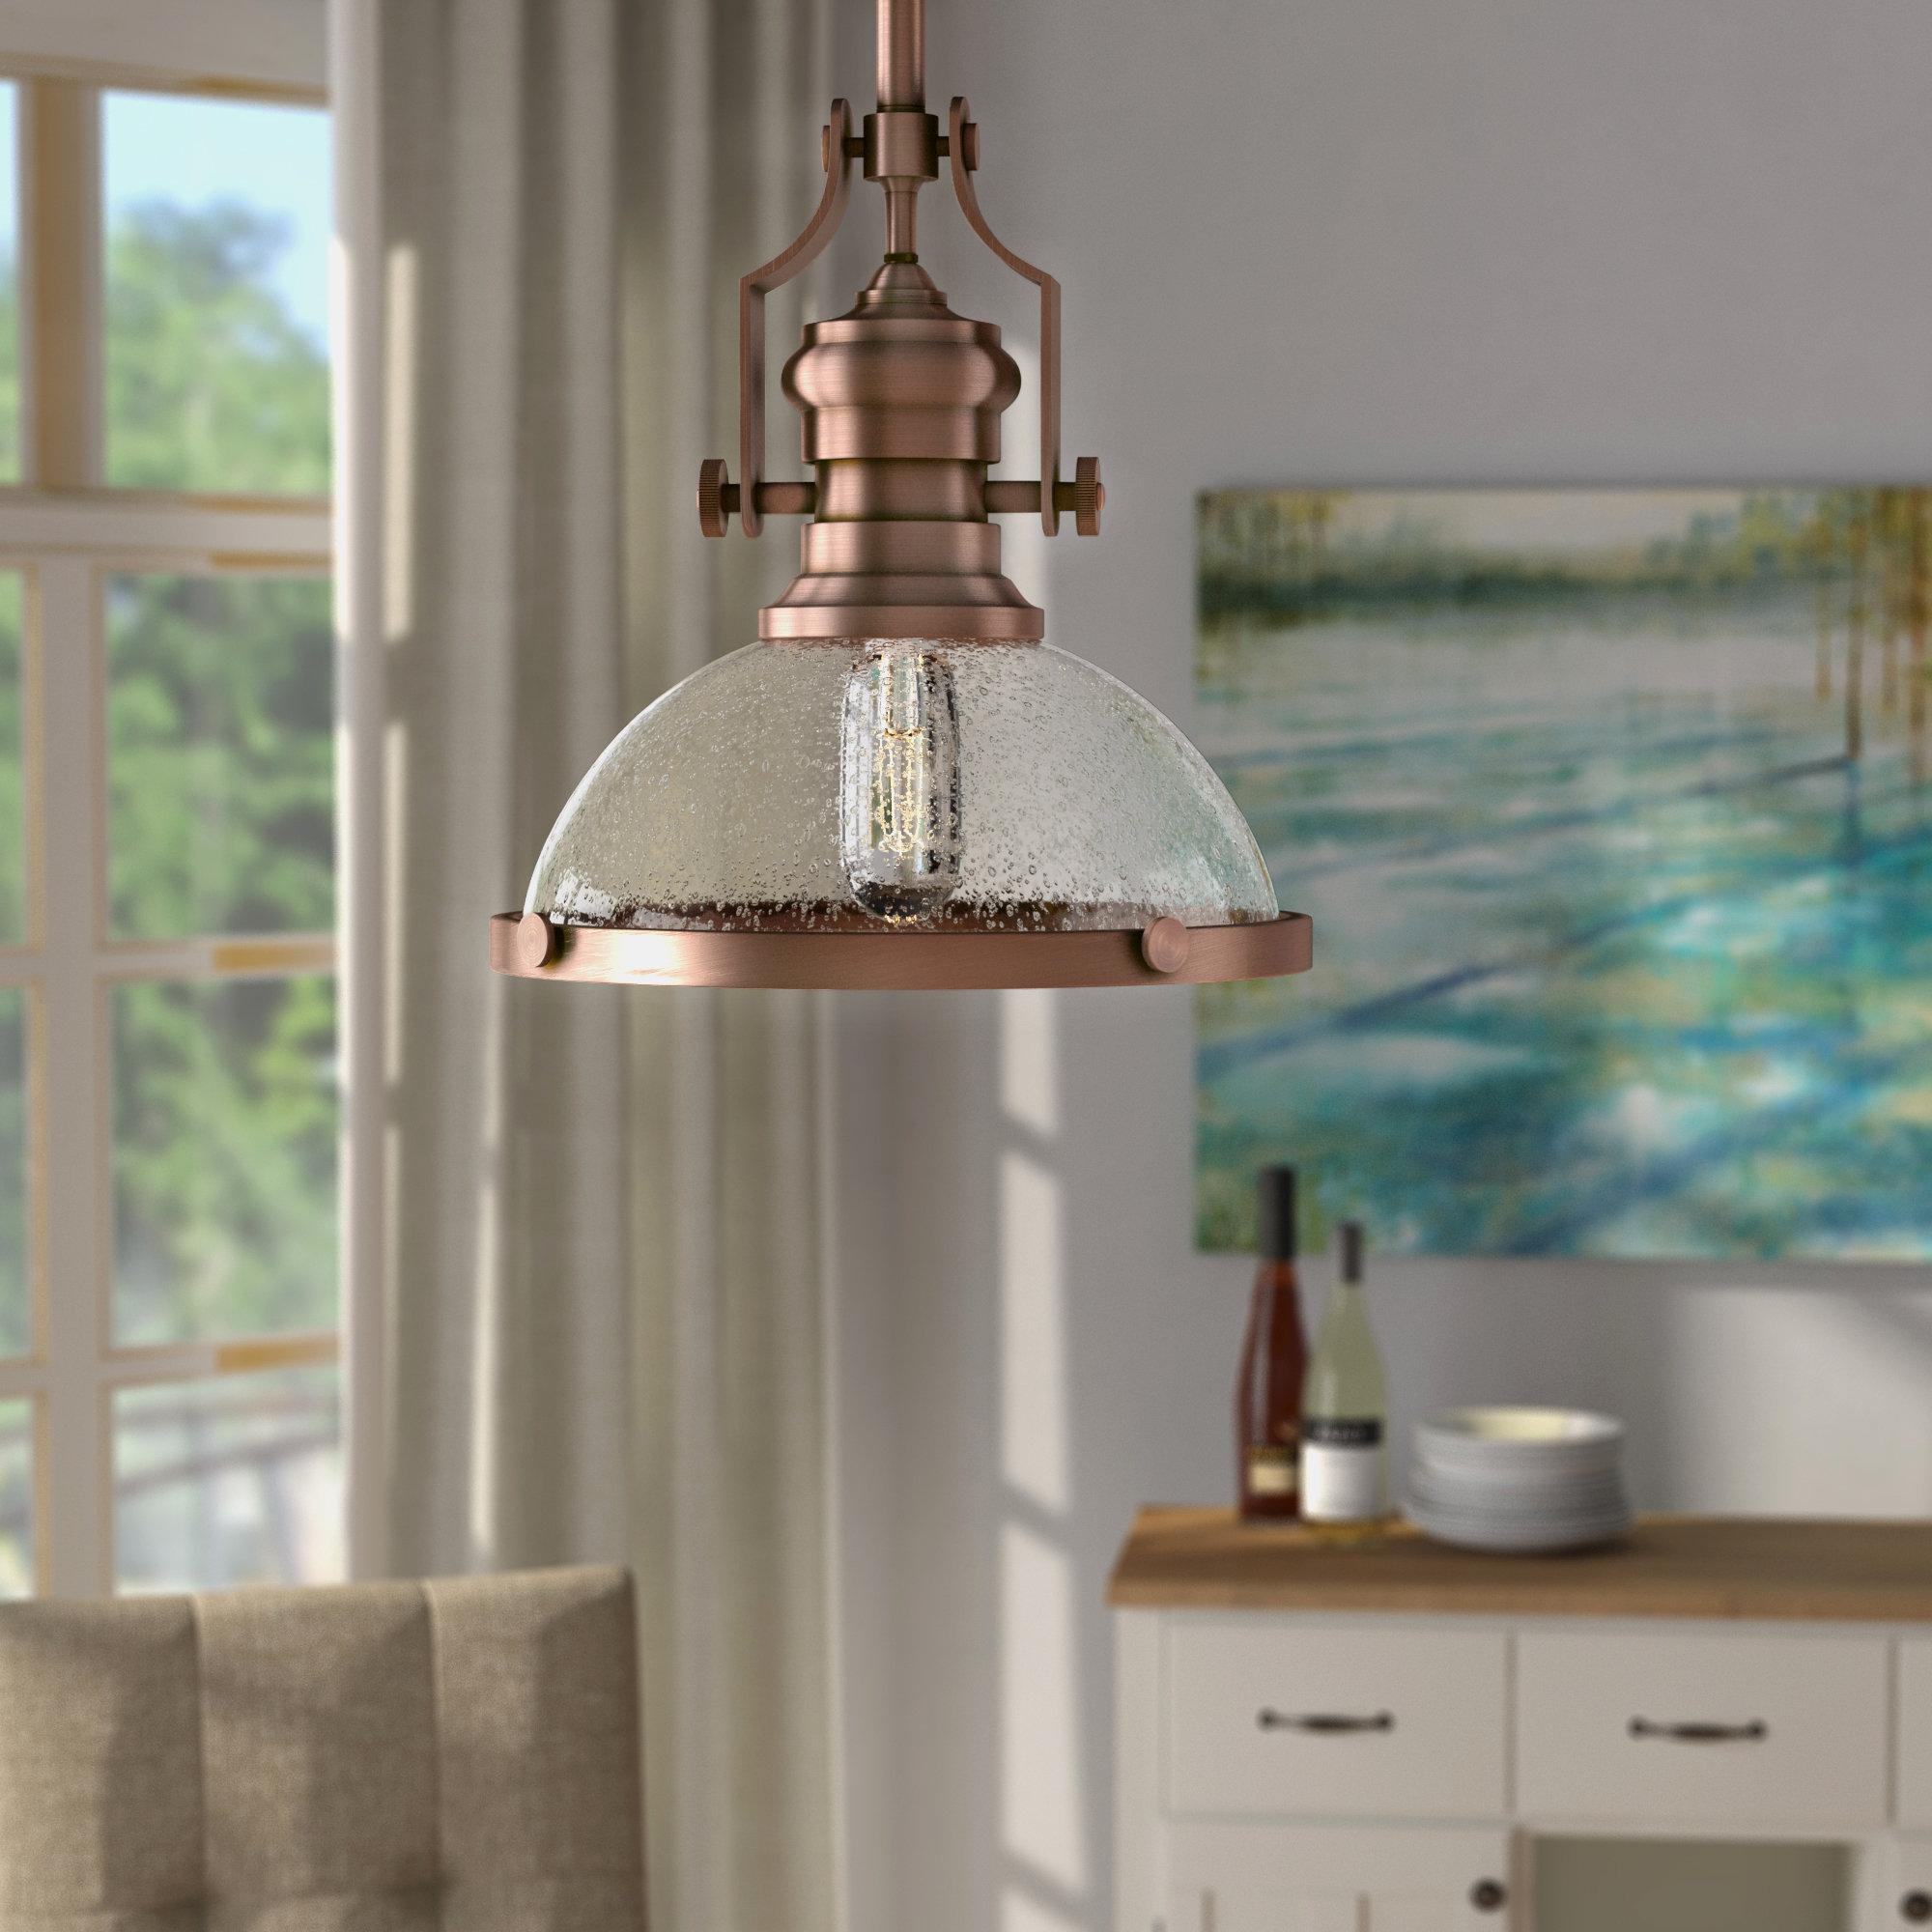 Newest Proctor 1 Light Bowl Pendants Regarding Breakwater Bay Priston 1 Light Single Dome Pendant & Reviews (Gallery 15 of 20)